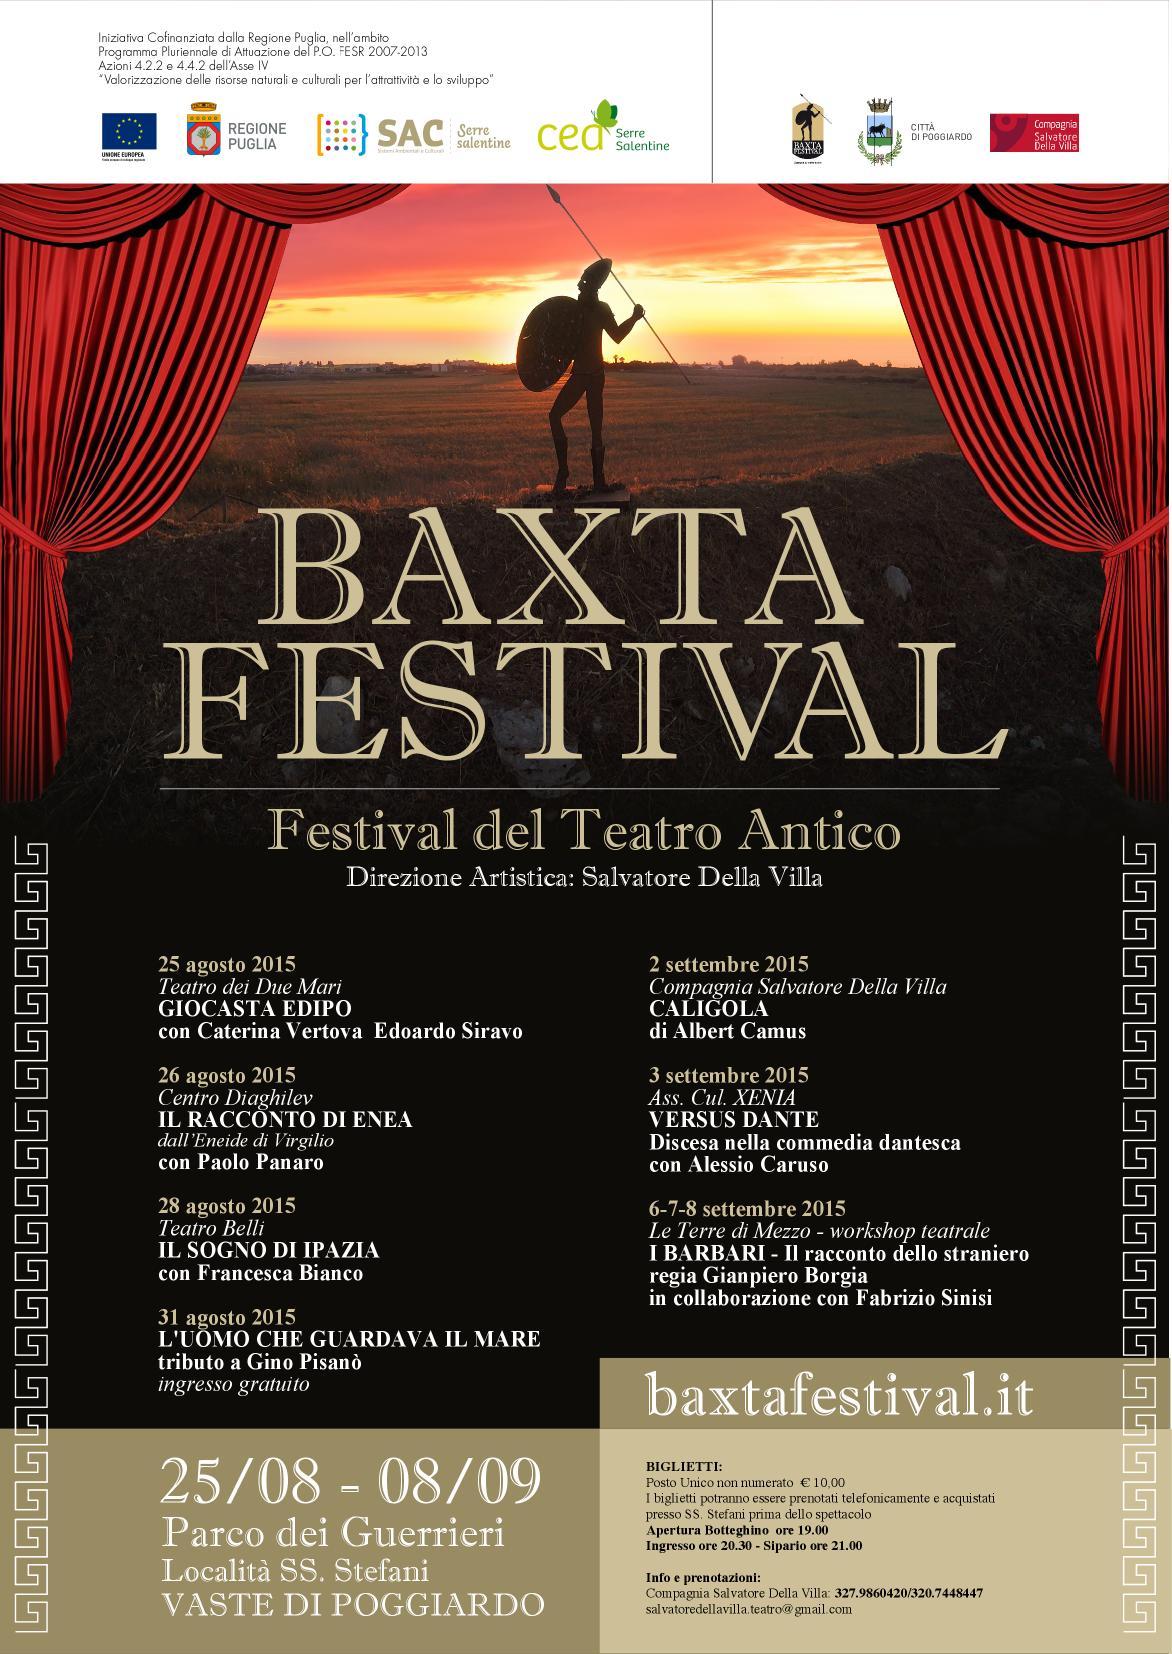 MANIFESTO BAXTA